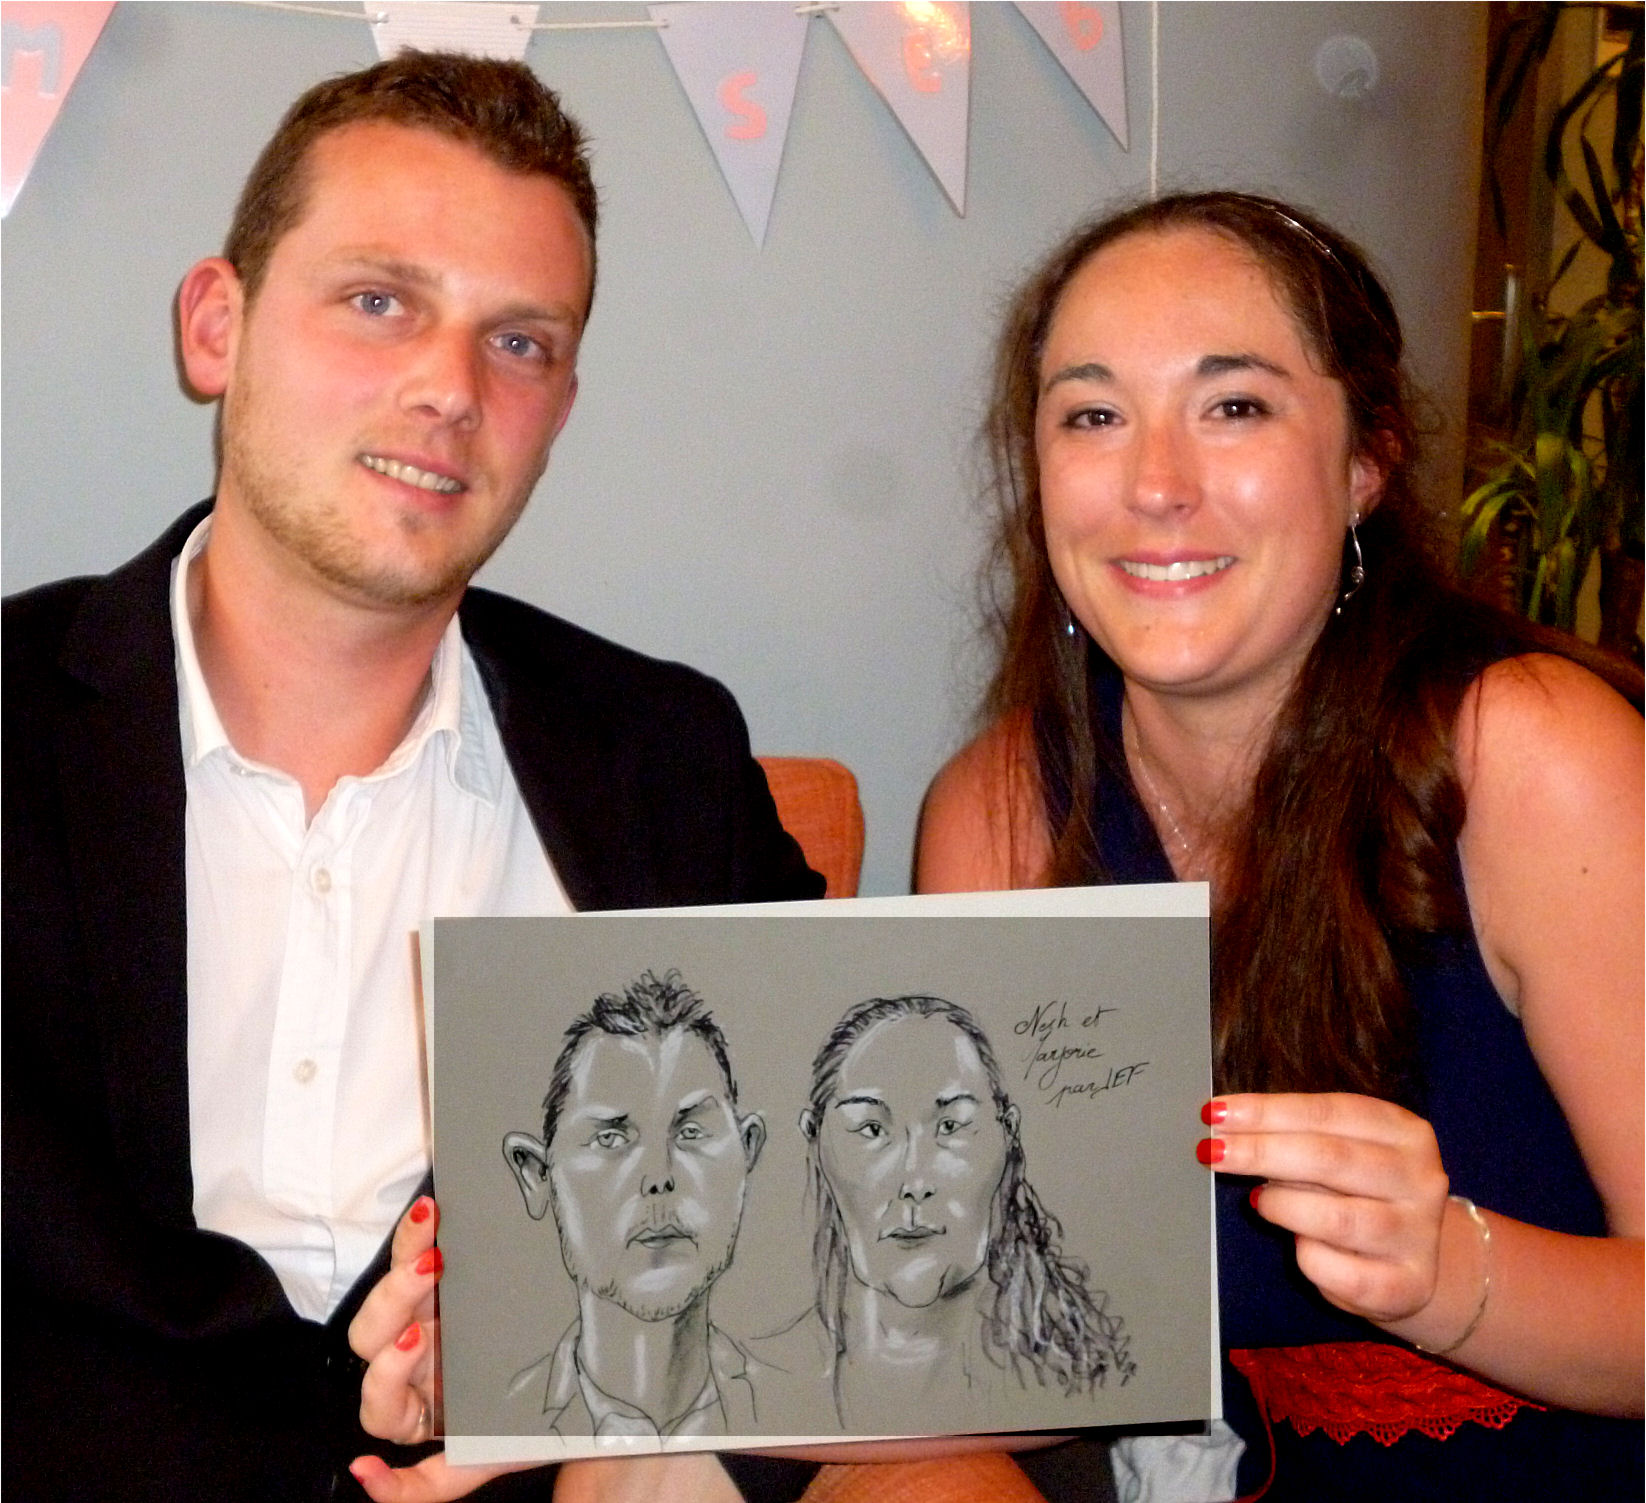 Nesh et Marjorie caricature de JEF